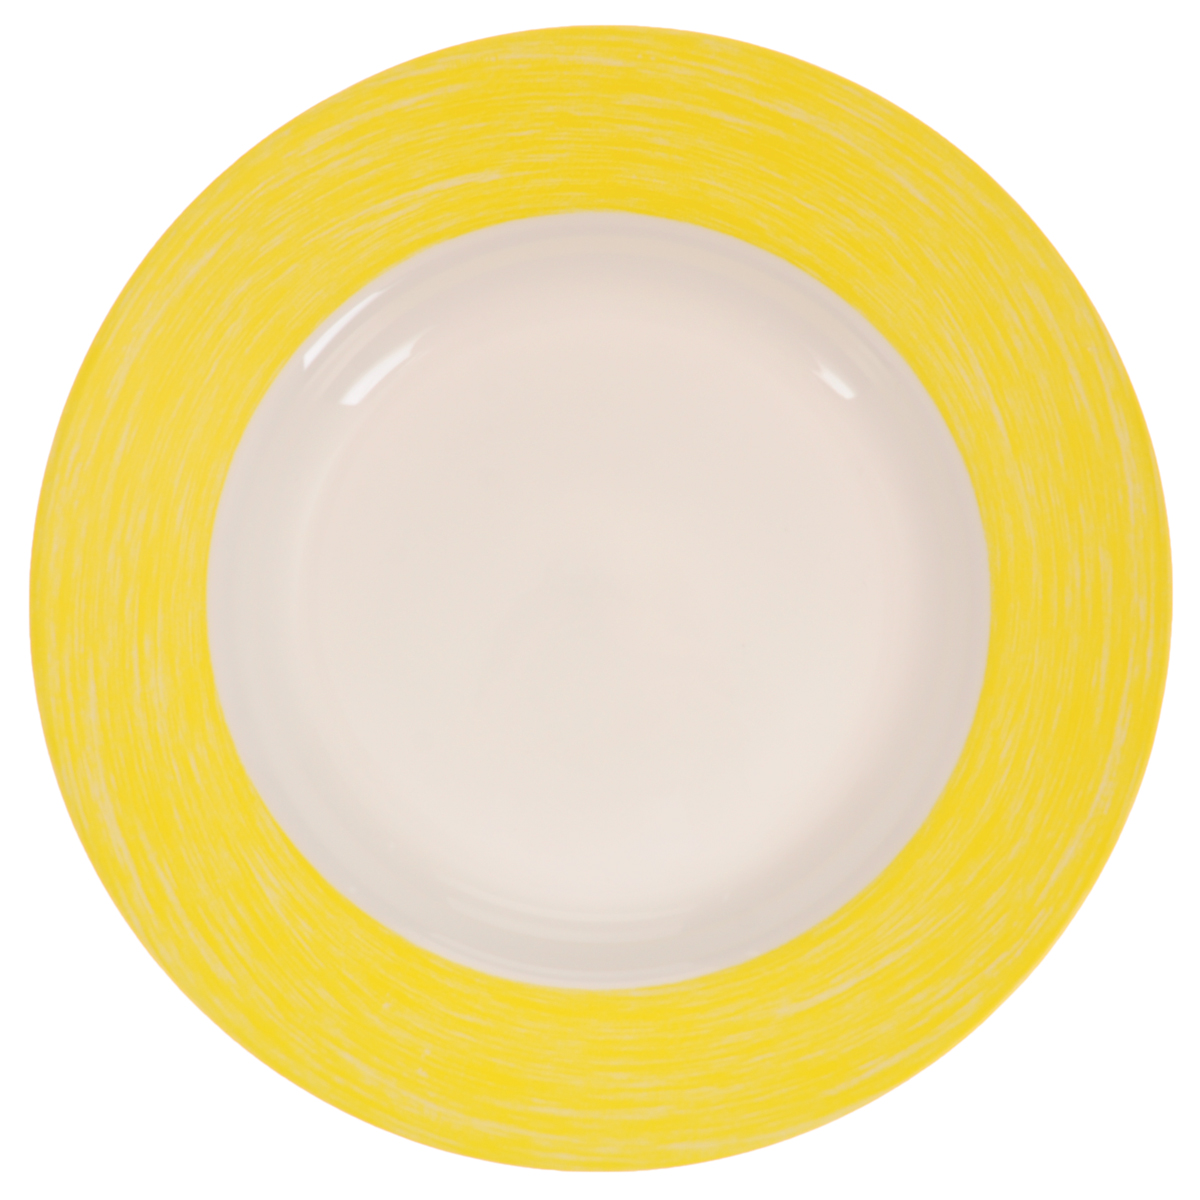 Тарелка глубокая Luminarc Color Days Yellow, диаметр 22 см тарелка глубокая luminarc cotton flower диаметр 21 см